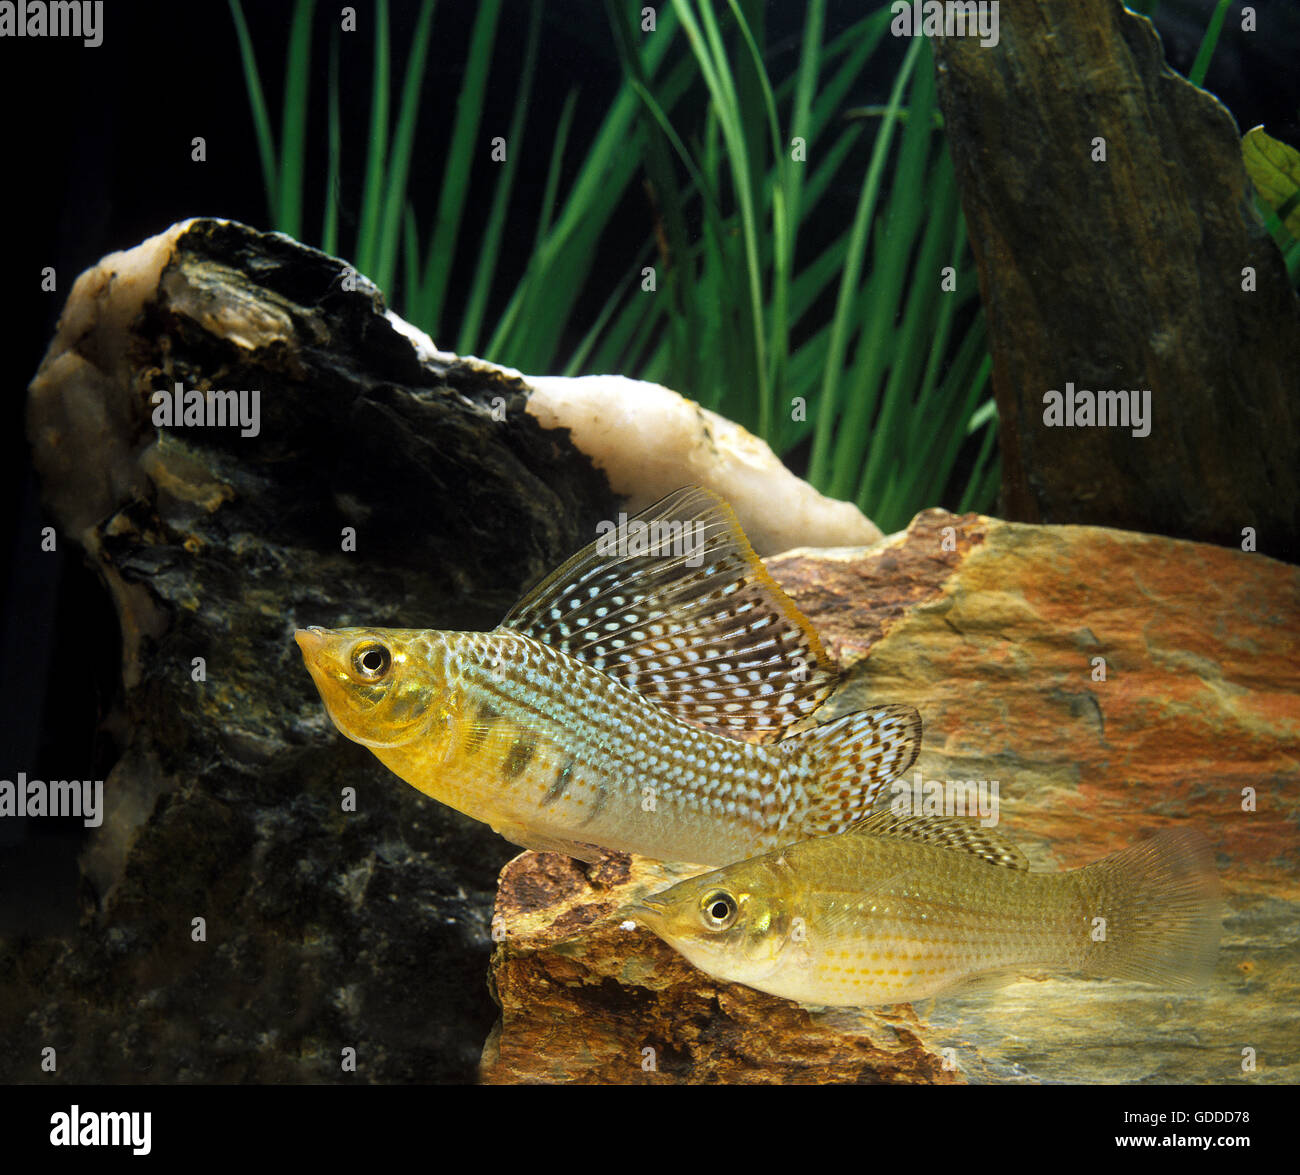 Sailfin Molly, poecilia velifera, Aquarium Fishes Stock Photo